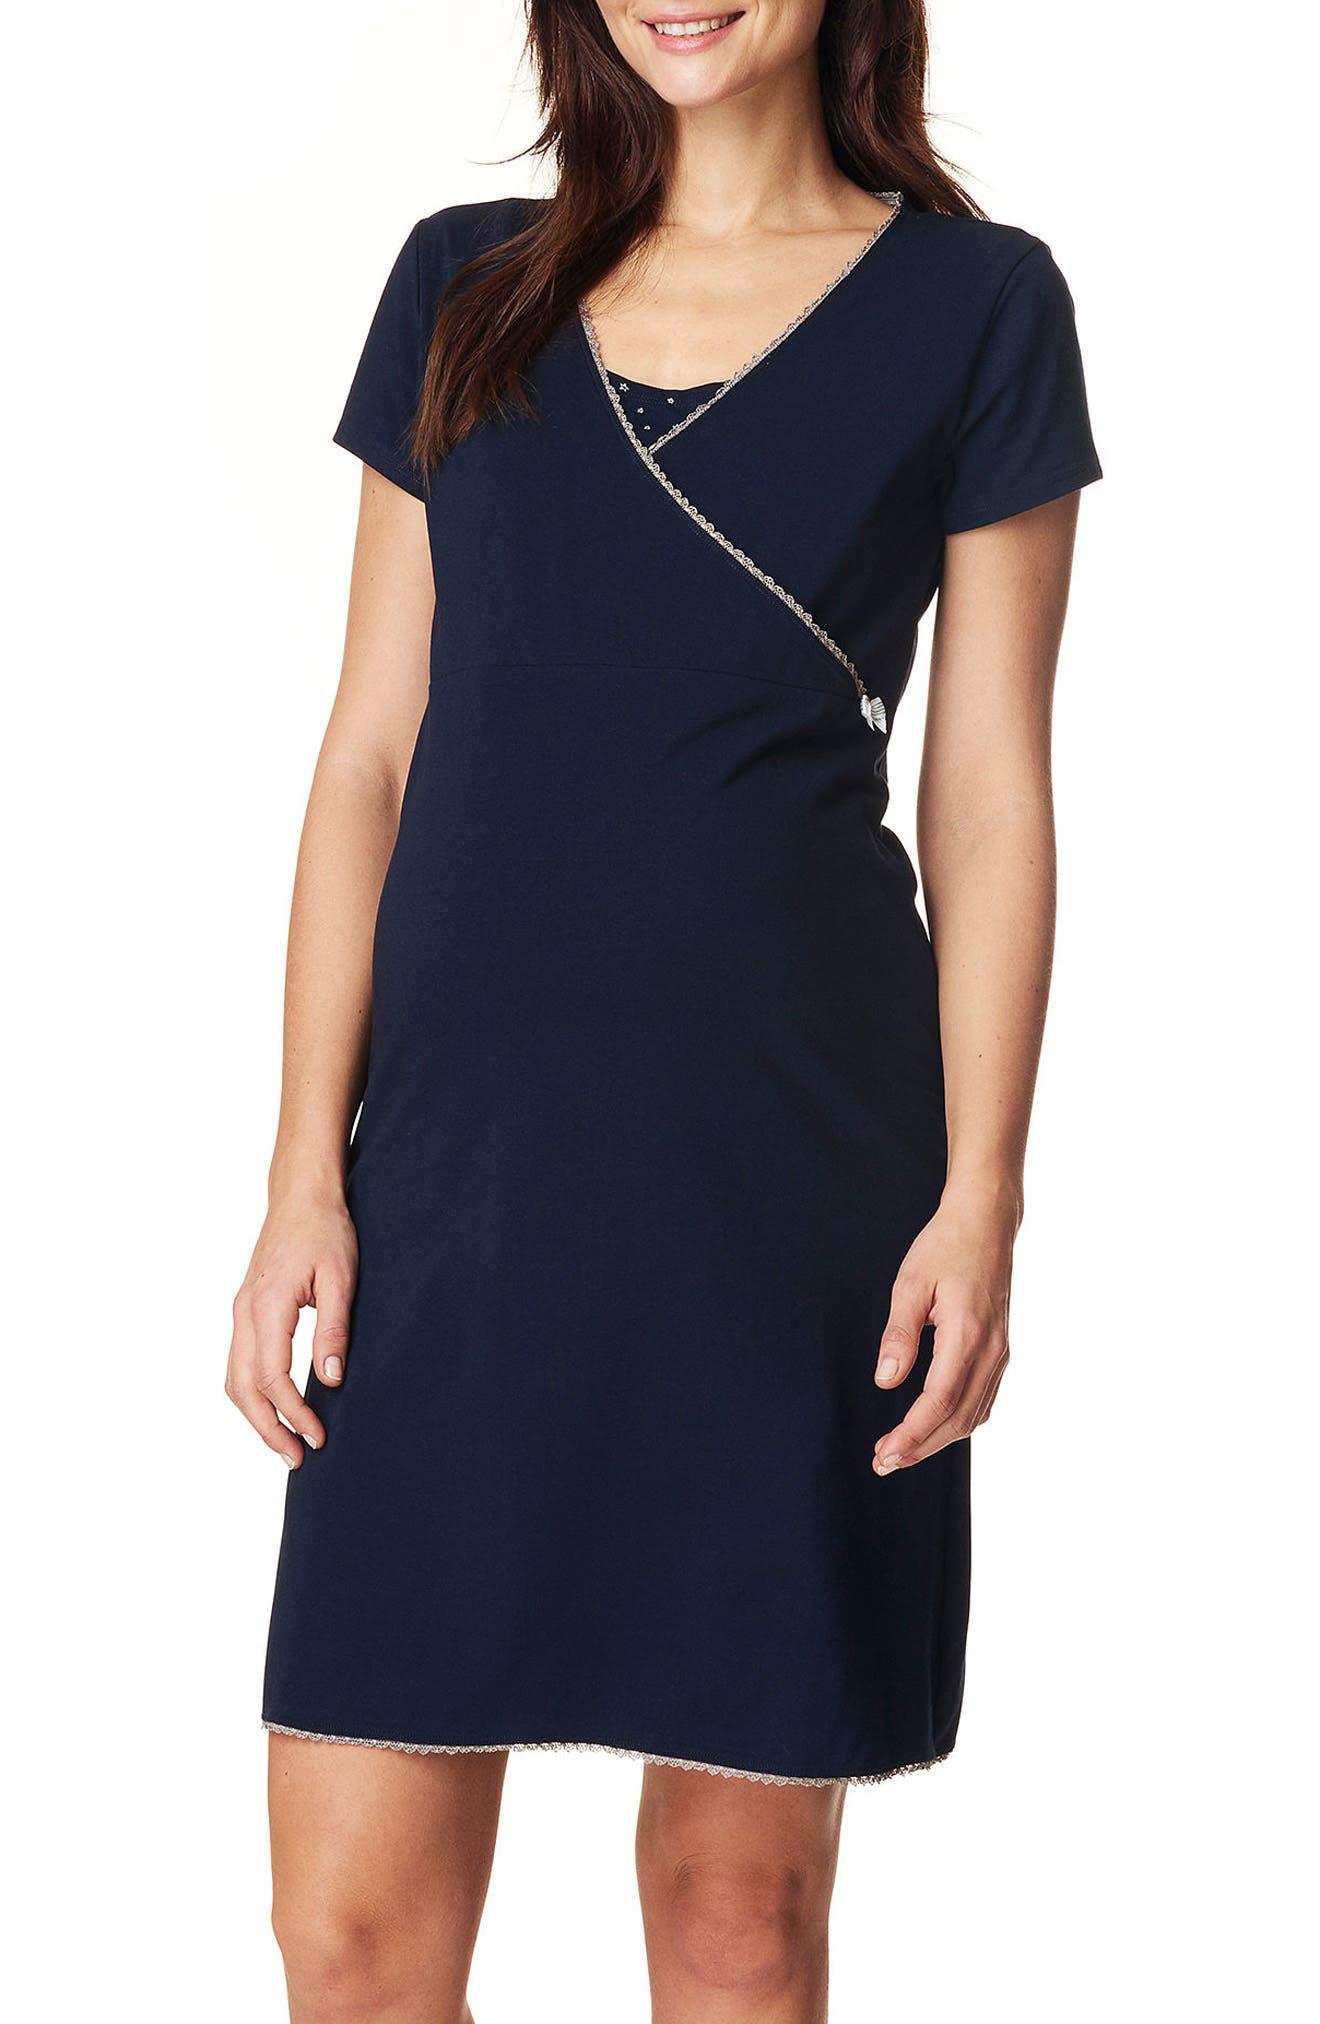 Noppies Kimm Maternity/Nursing Jersey Dress